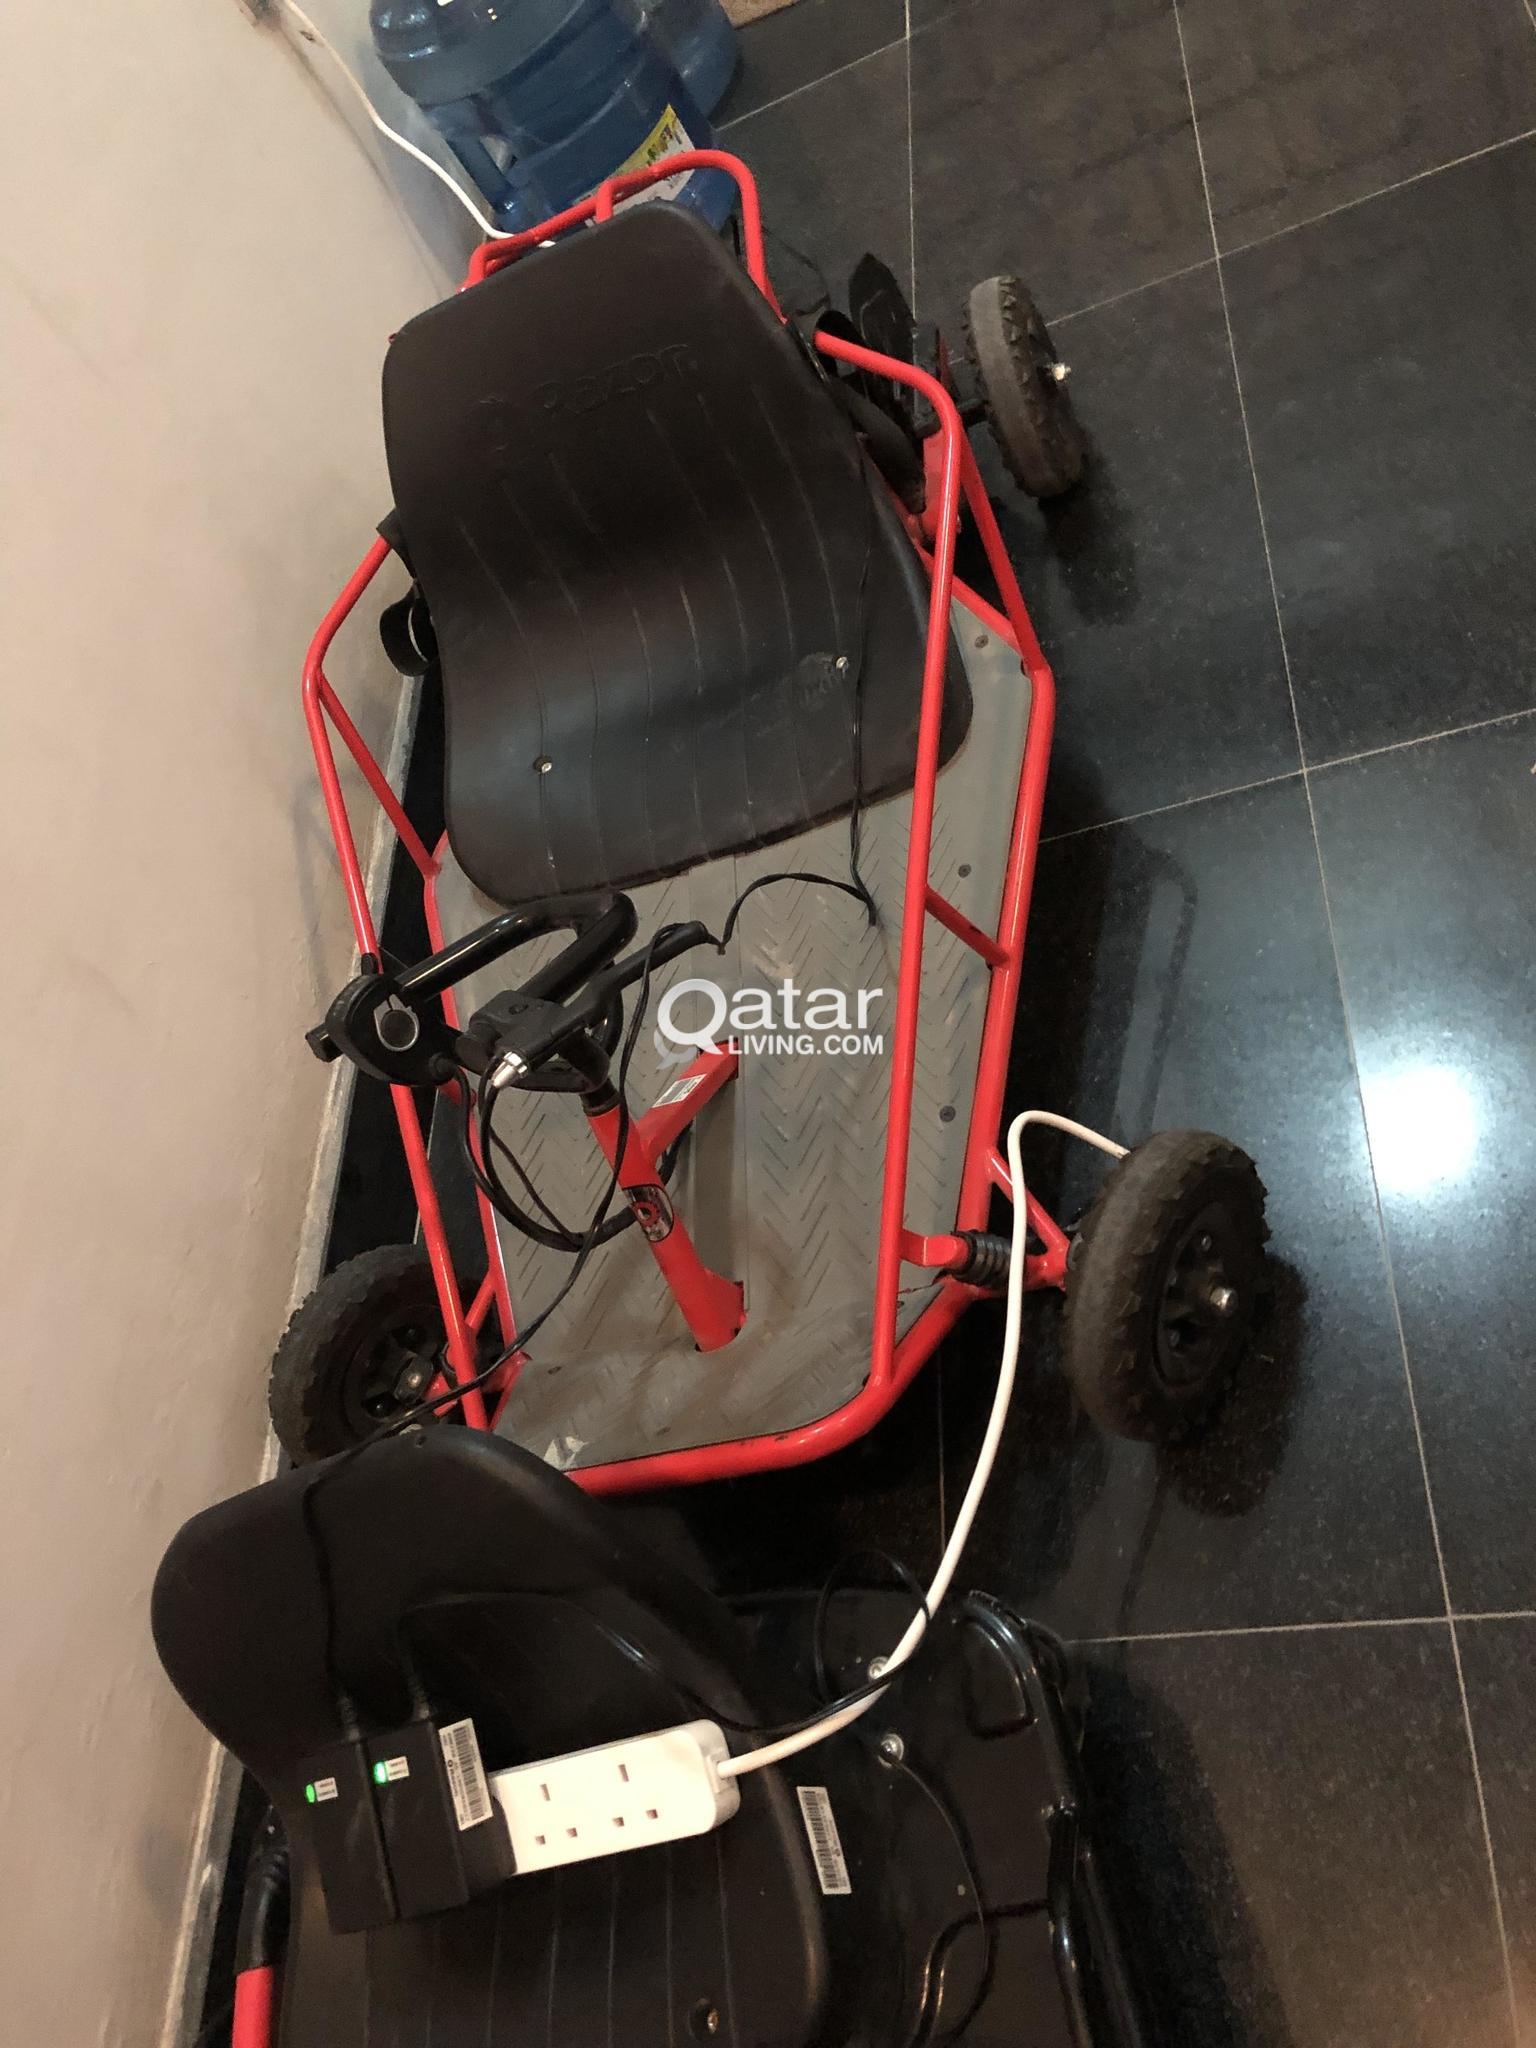 Amazingly Fun Razor Crazy Cart and Dune Buggy | Qatar Living